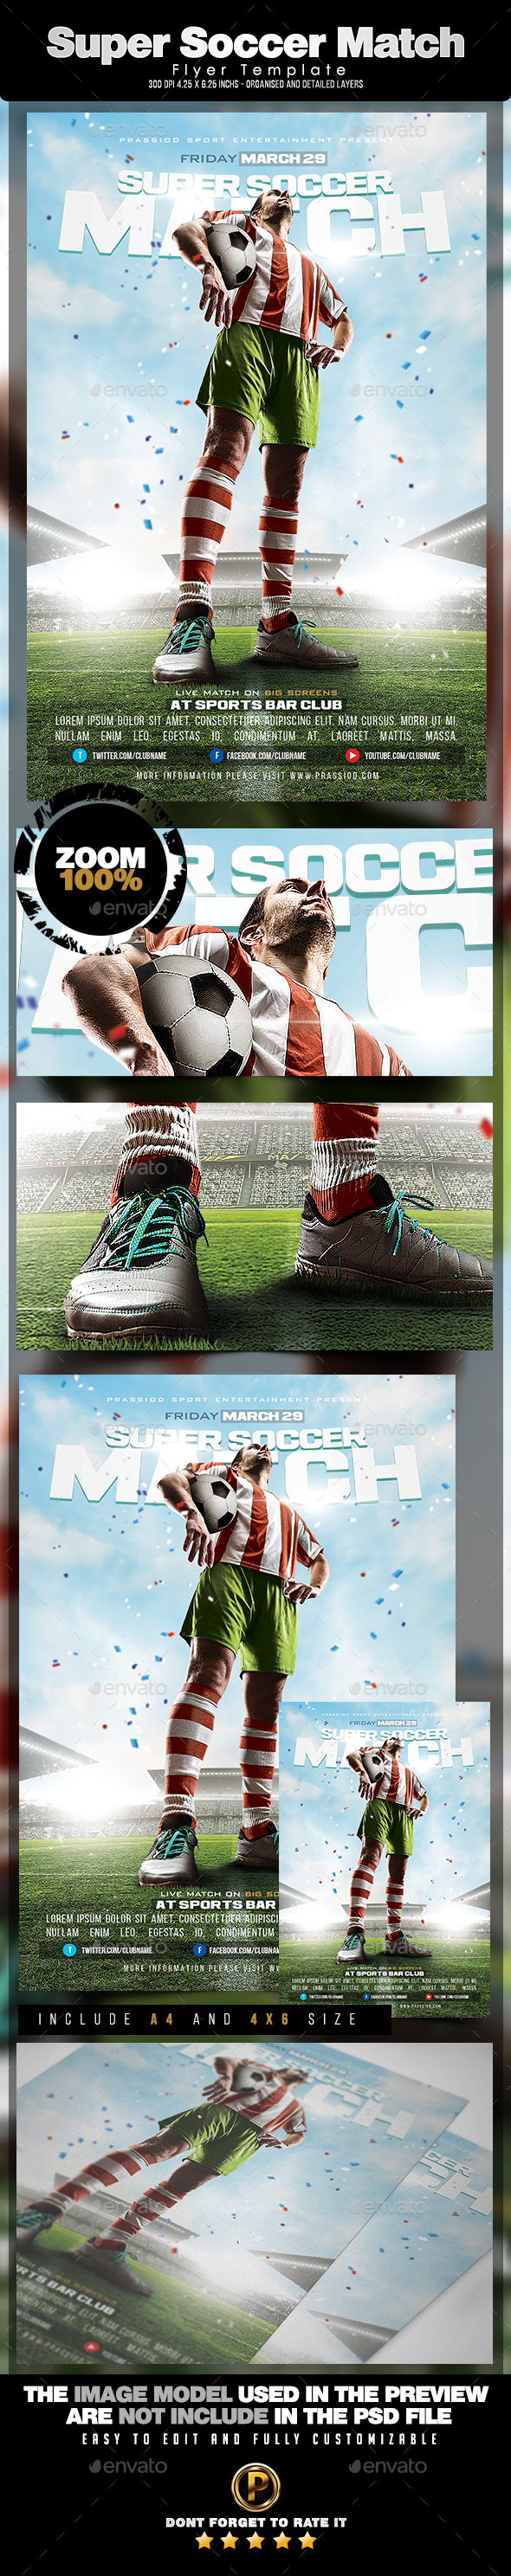 Super Soccer Match Flyer Template - Sports Events